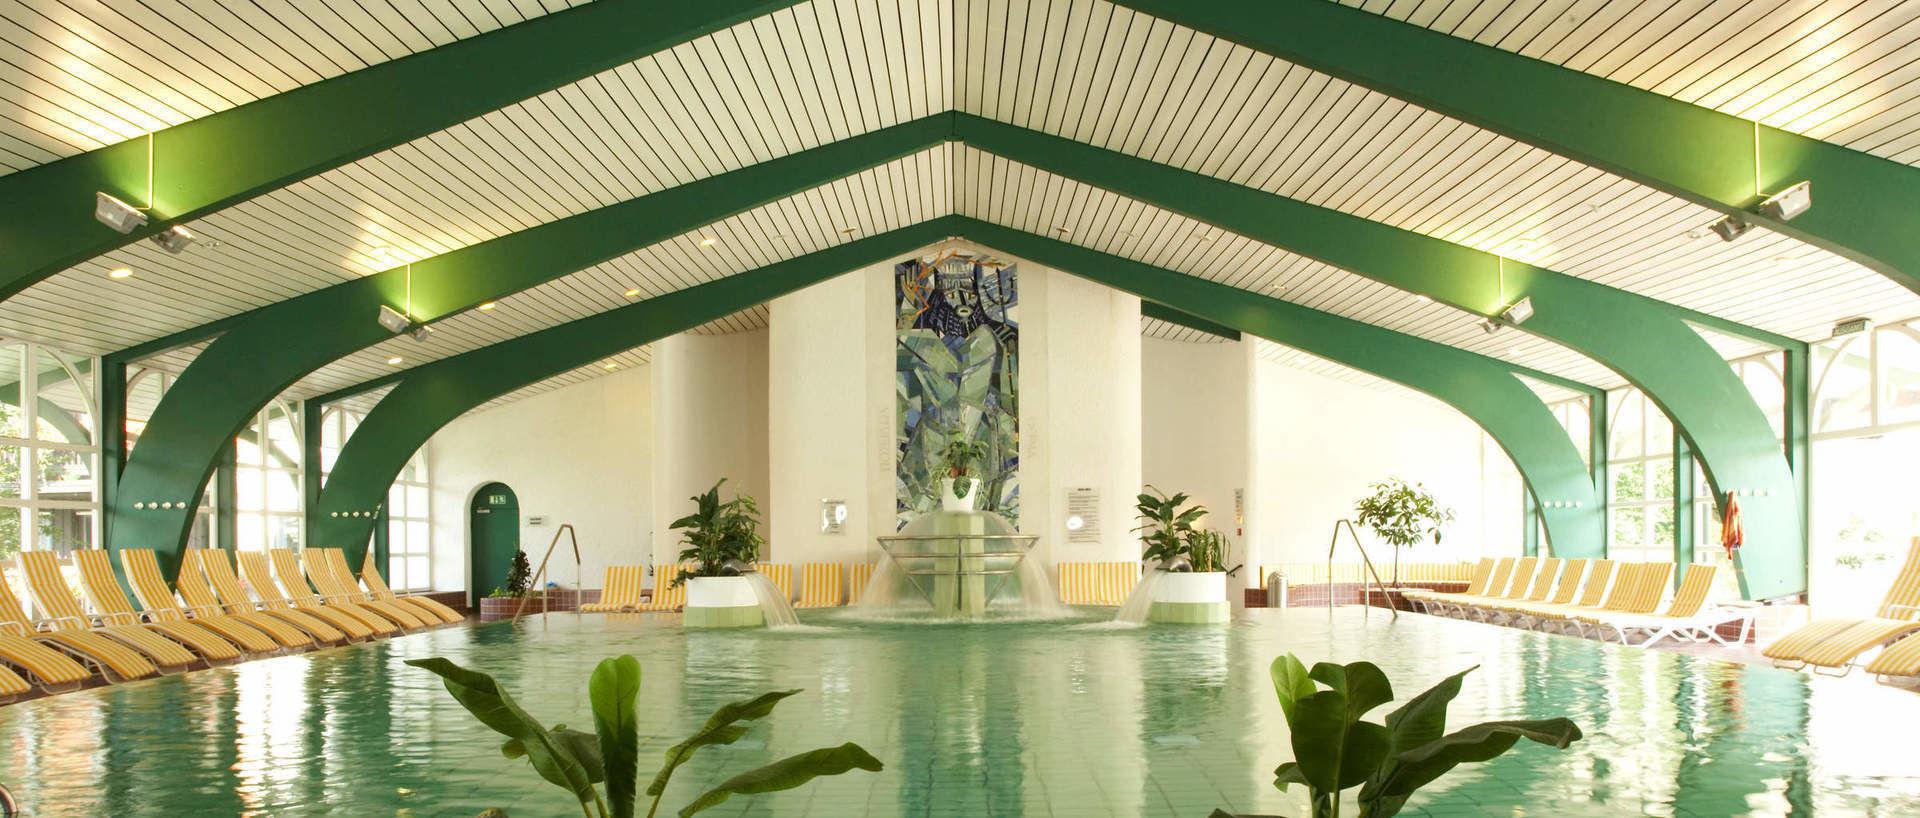 Badkamer Douchen In Bad ~ Erholung pur 2 Hotel garni Glockenspiel Bad Griesbach Bayern